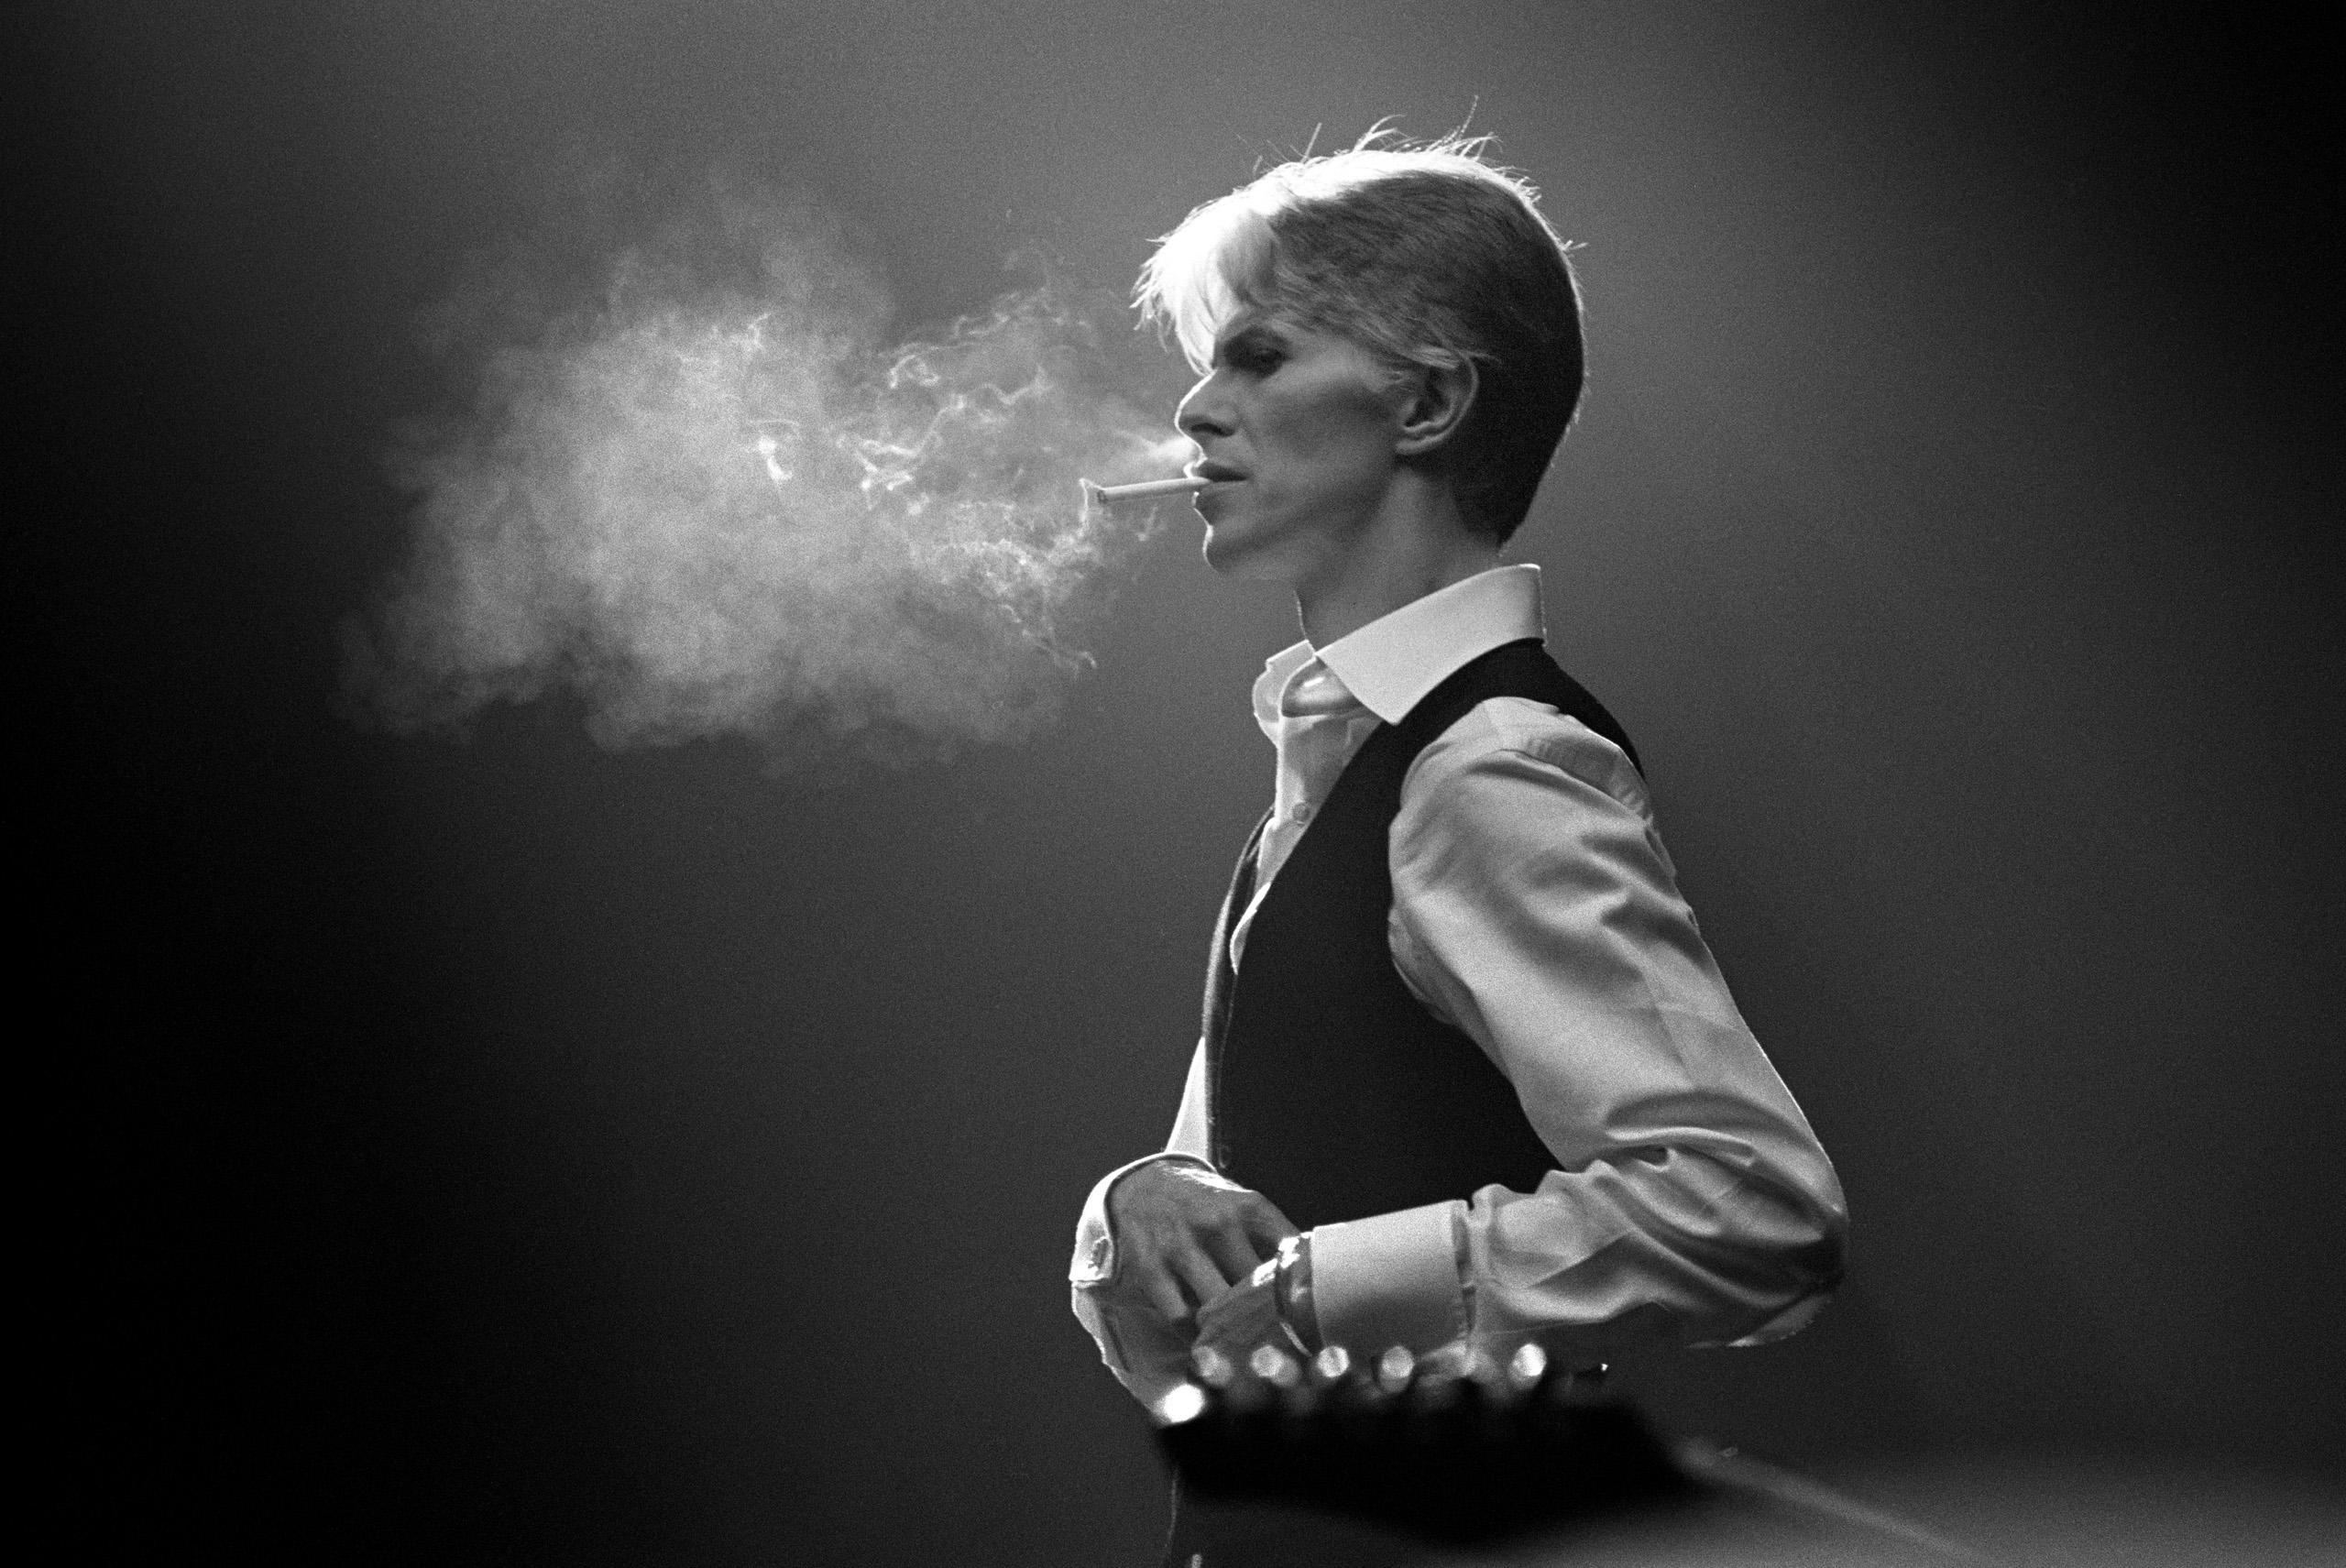 Bowie's Thin White Duke persona, smoking a Gitanes cigarette,1976.